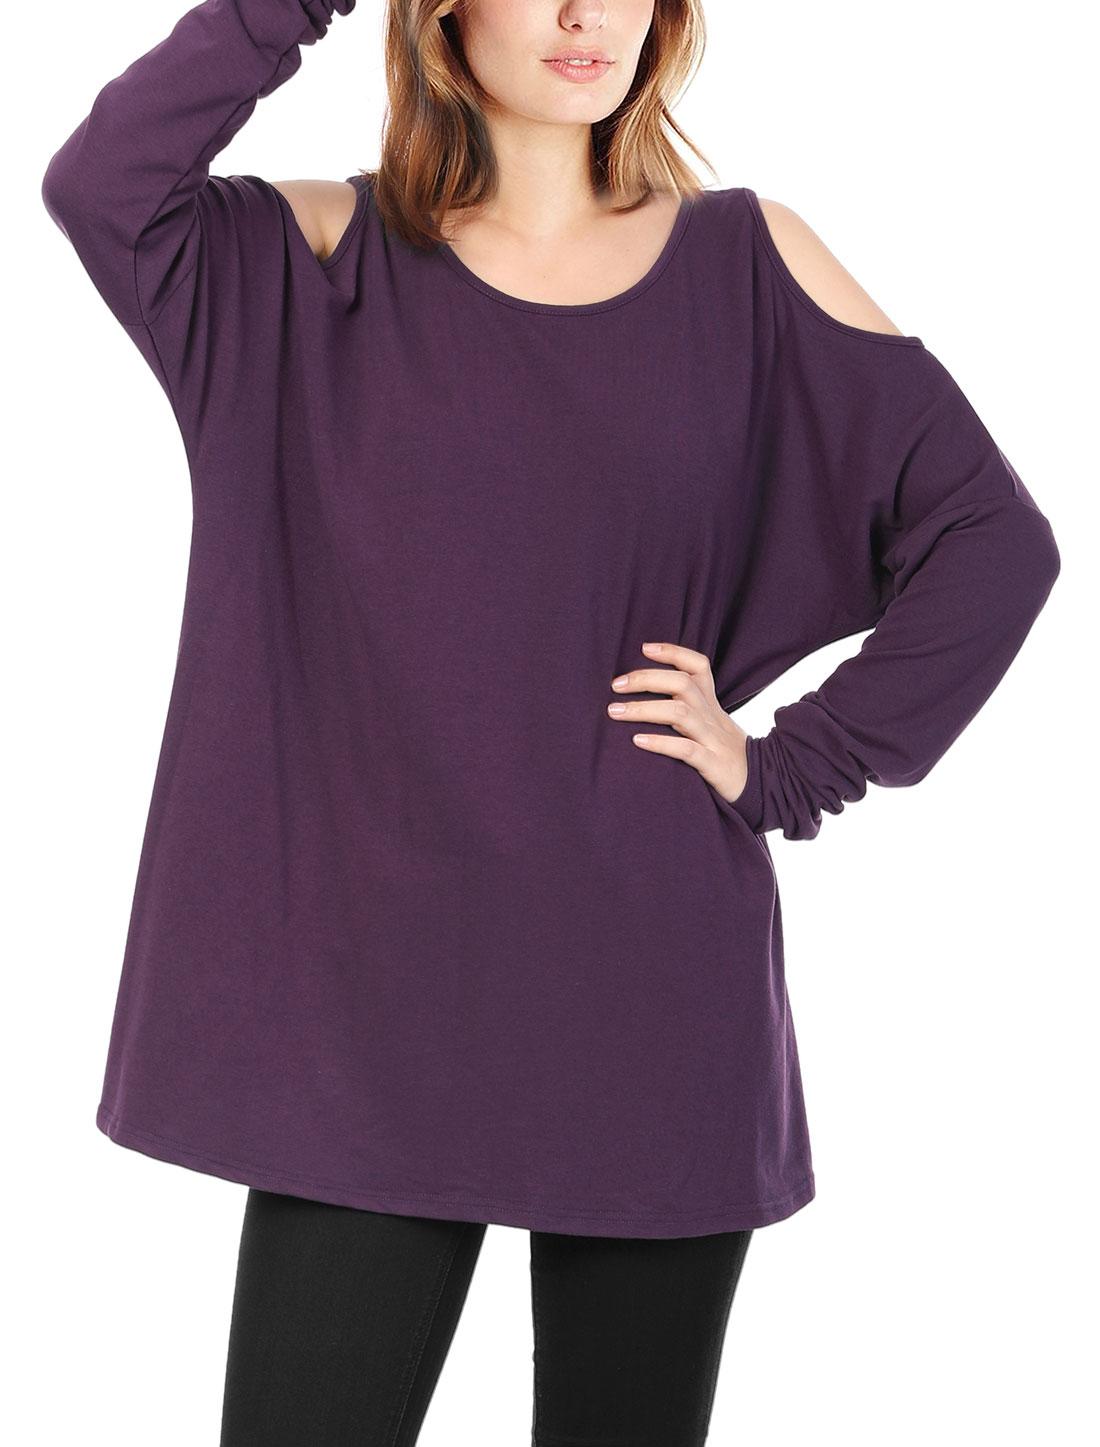 Ladies Cut Out Shoulder Oversized Tunic Top Purple XL